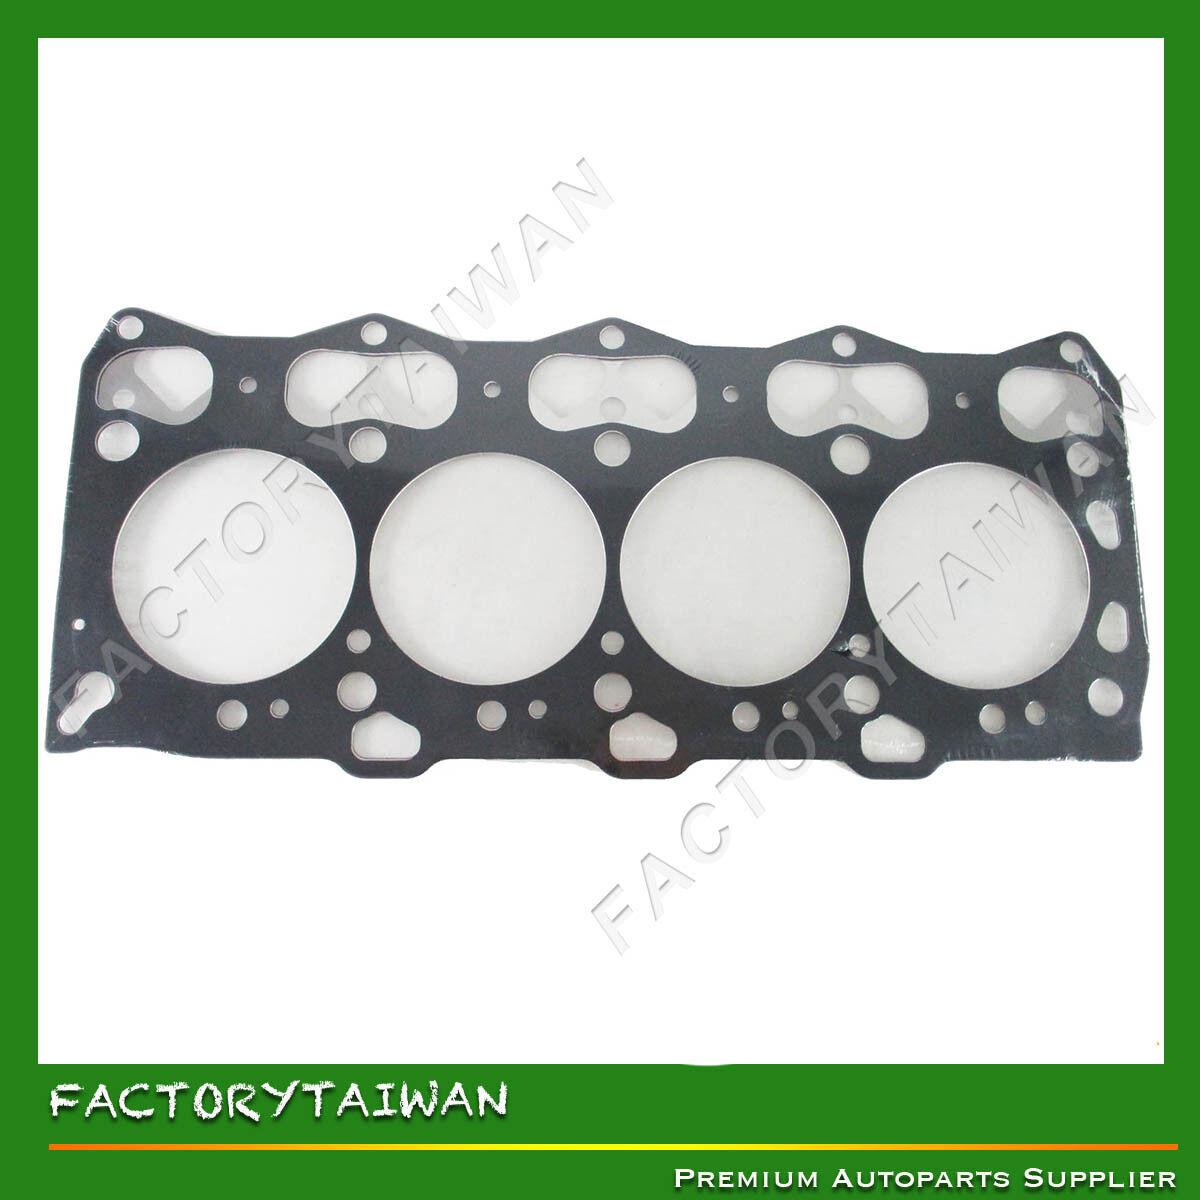 Factorytaiwan Head Gasket Graphite for Yanmar 3TNA72 // 3TNE72 100/% Taiwan Made